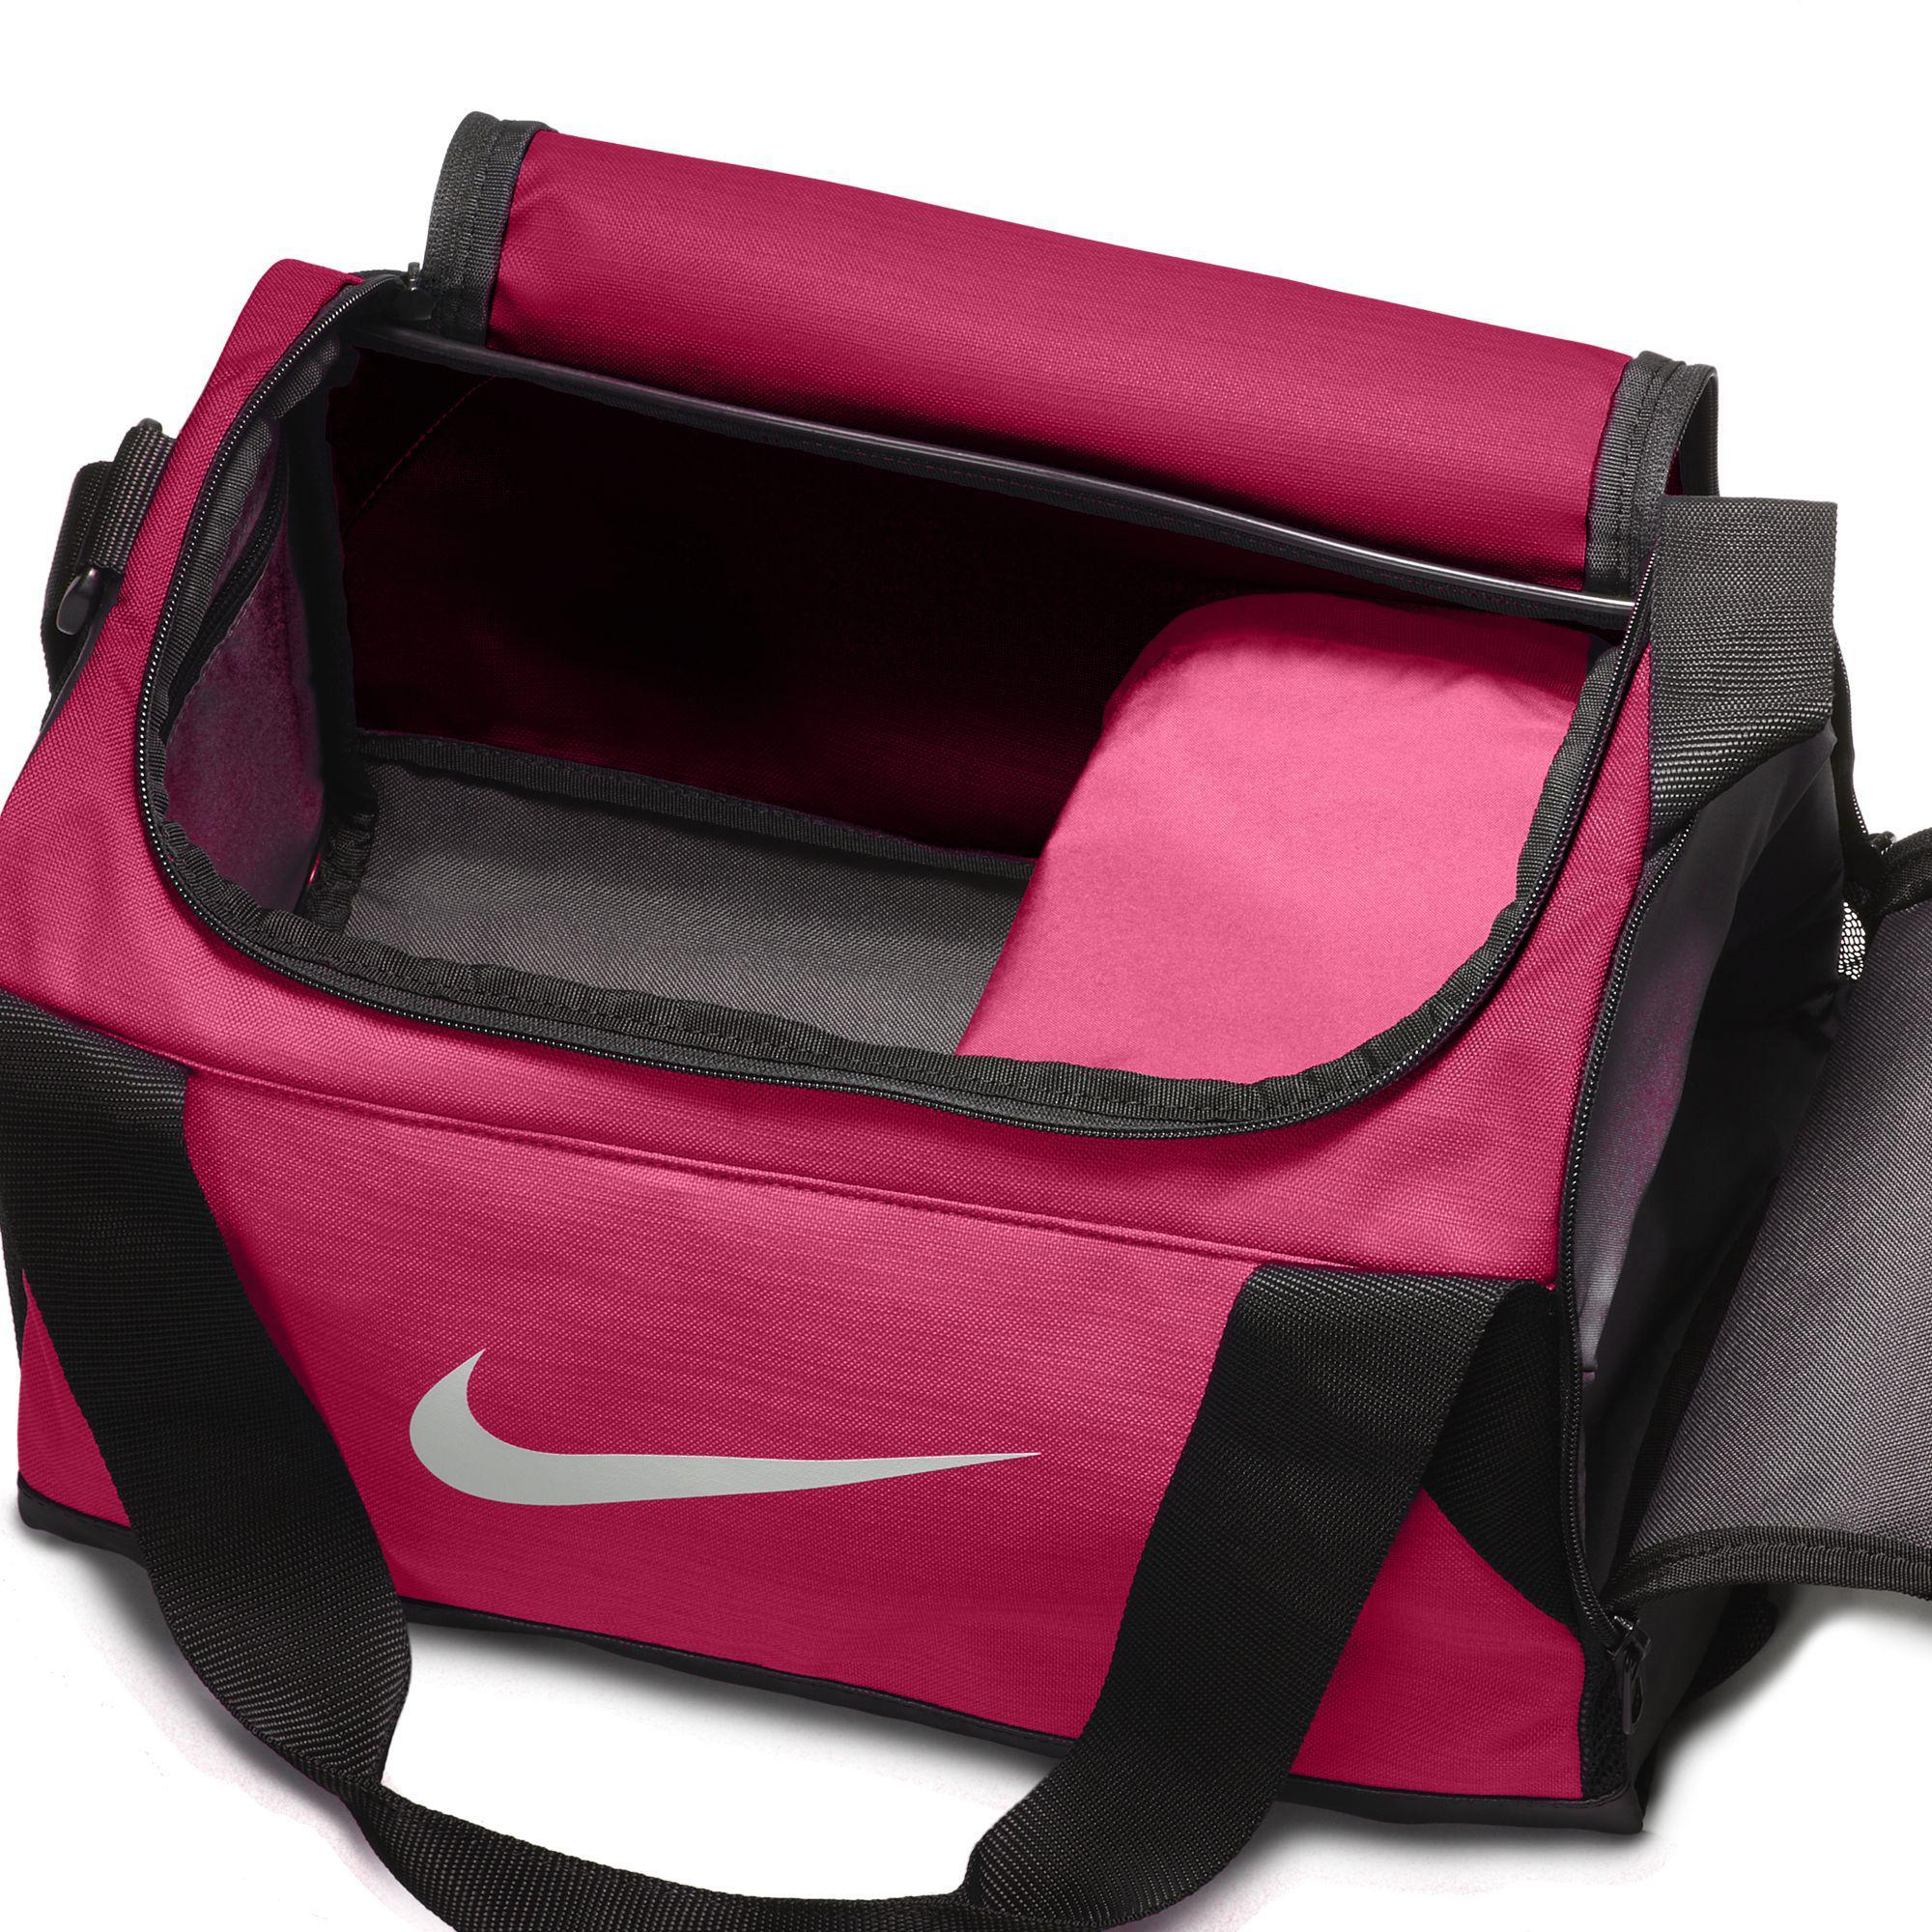 24511d188189 Nike Brasilia Extra Small Training Duffel Bag - Pink Black ...